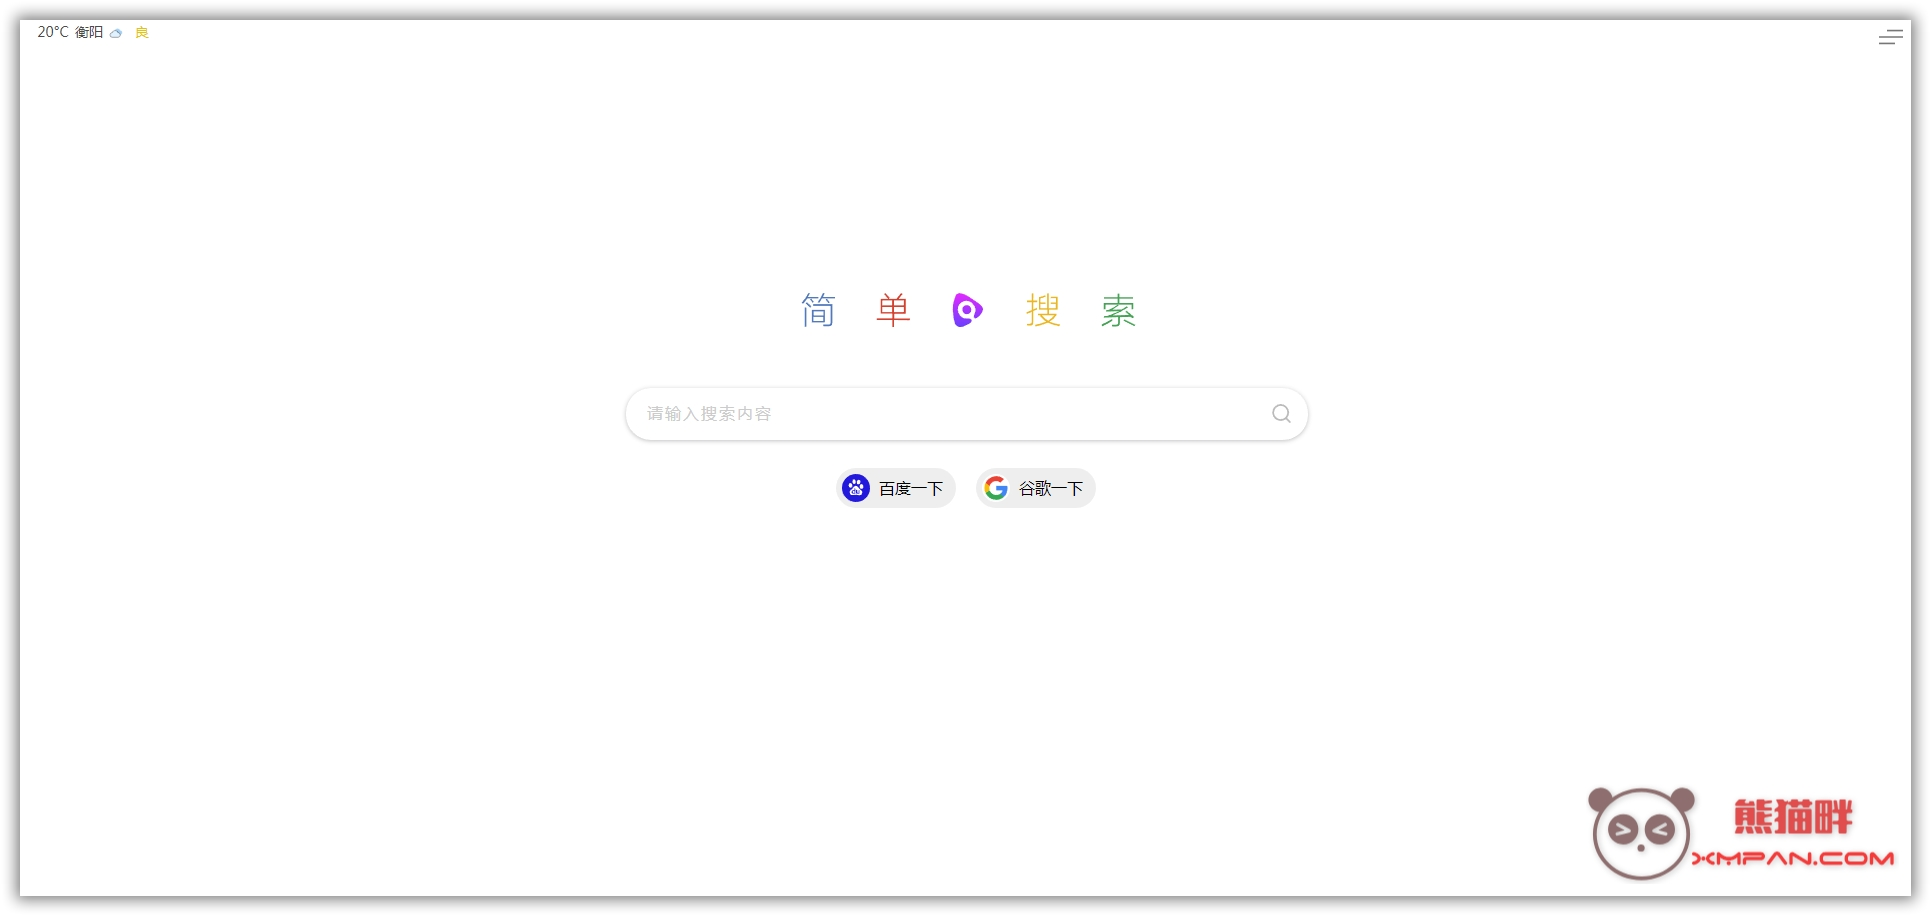 PHP简单搜索导航页源码